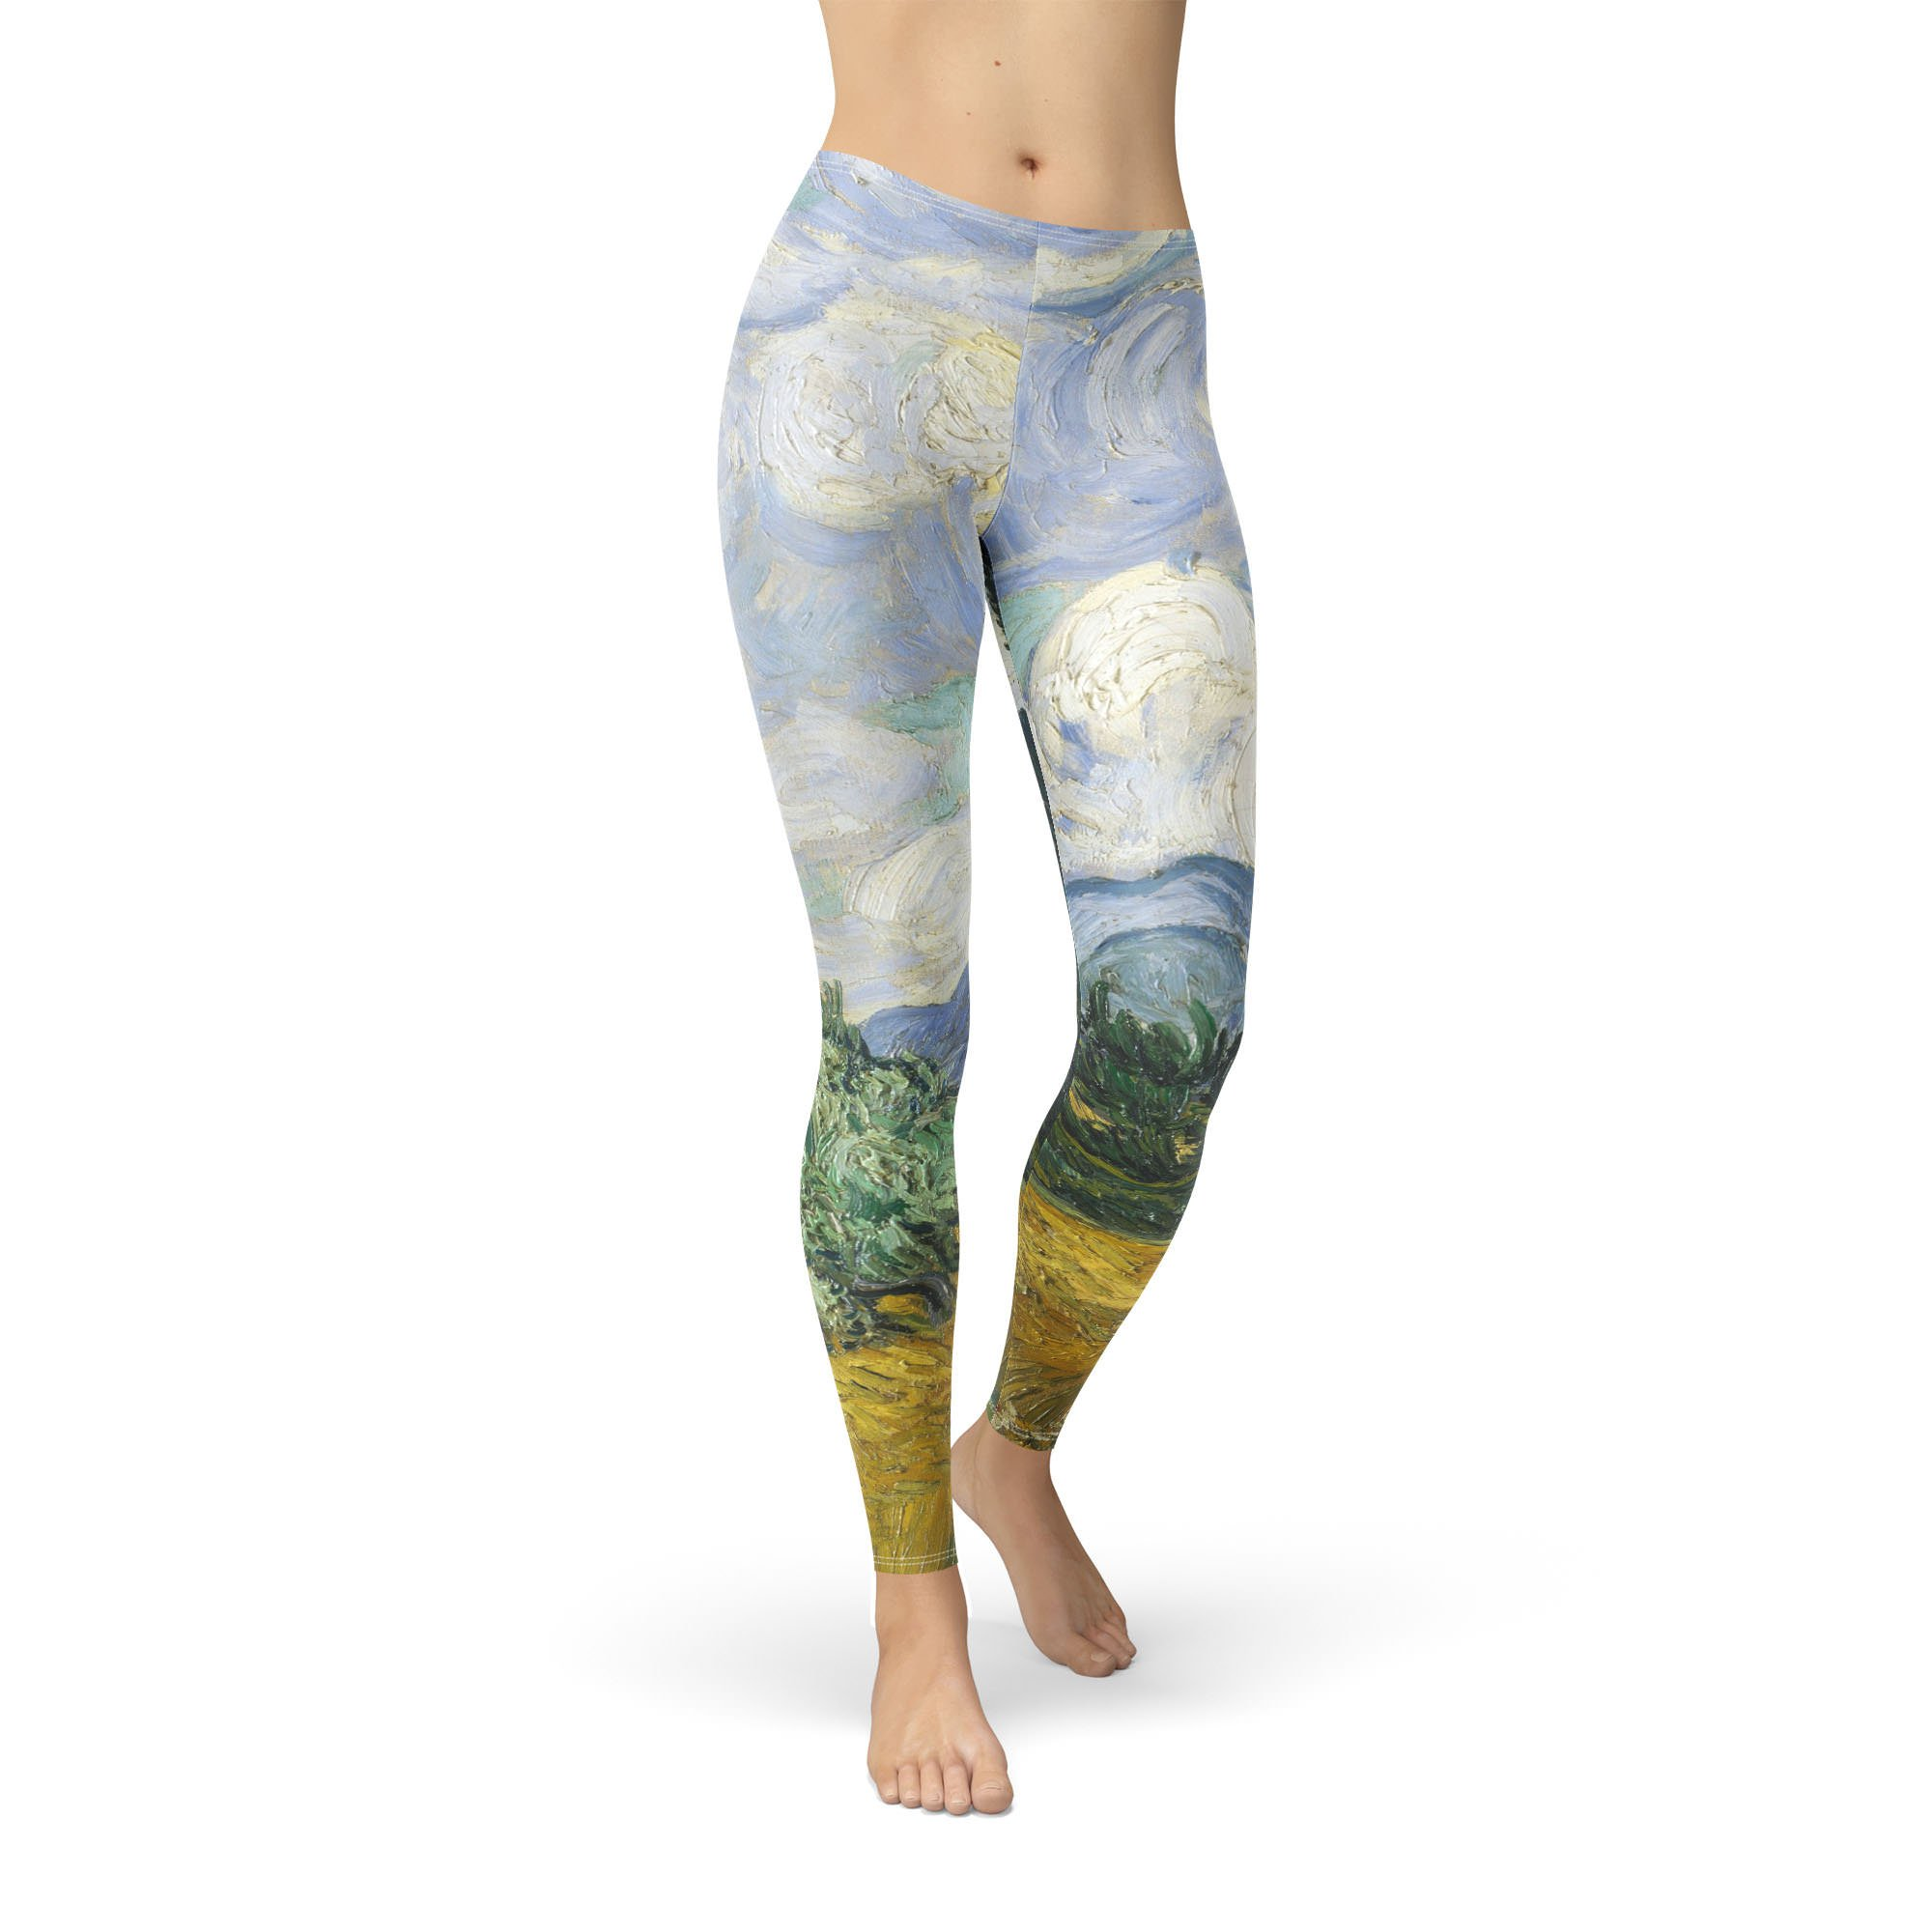 Vincent Van Gogh Fine Art Painting Winter Leggings - Fleece, Full Length, Mid/High Waist